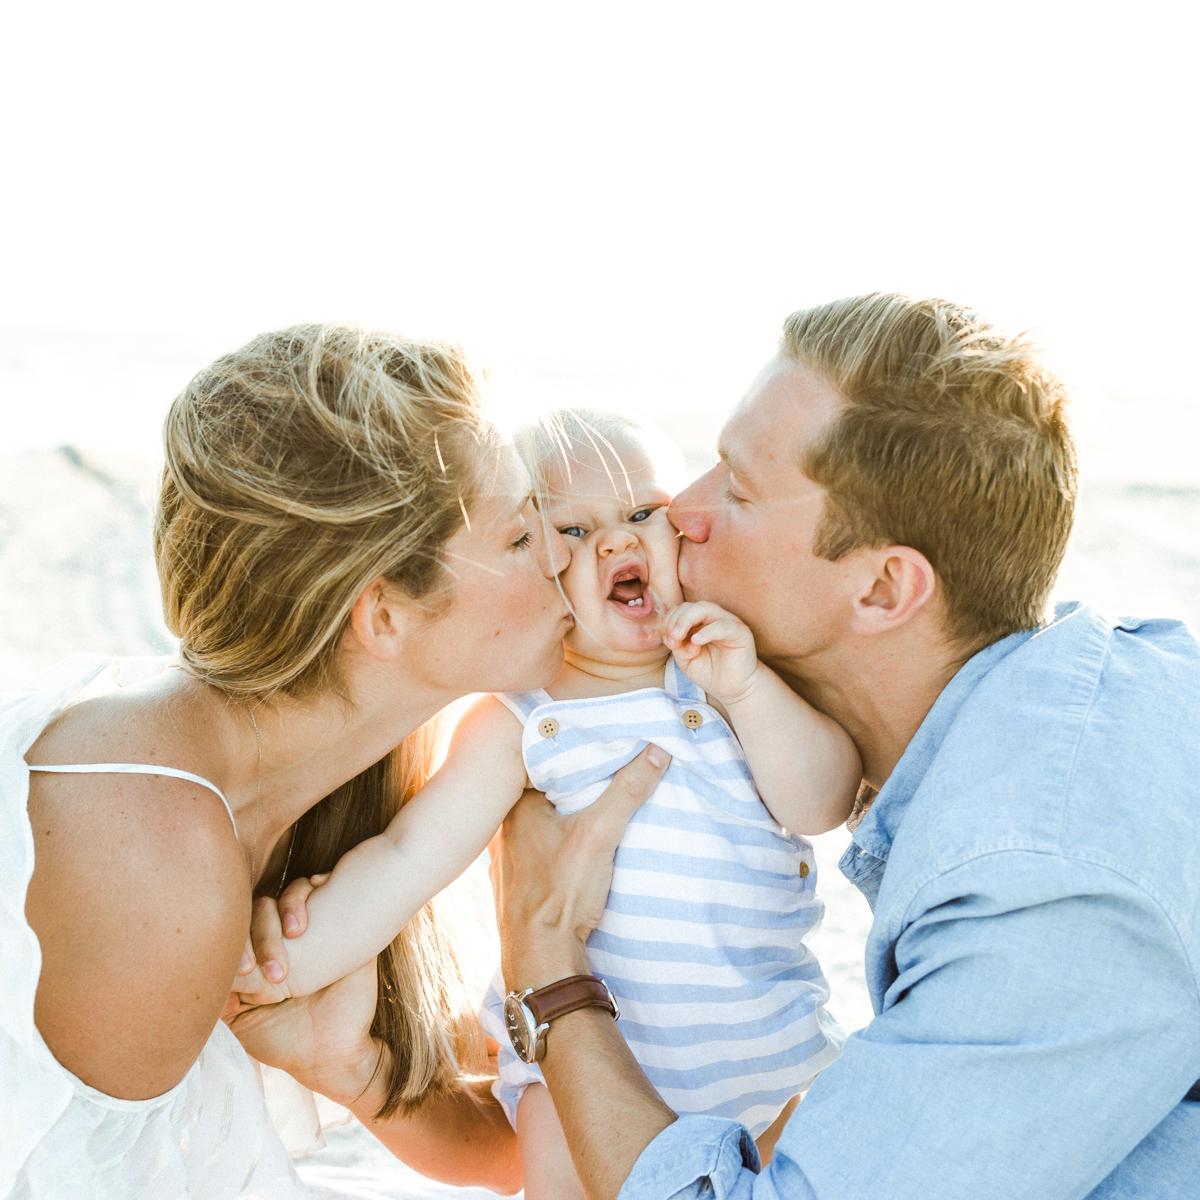 lissiephoto_newyorkcity_family_photography_baby_newborn_photographer-36.JPG